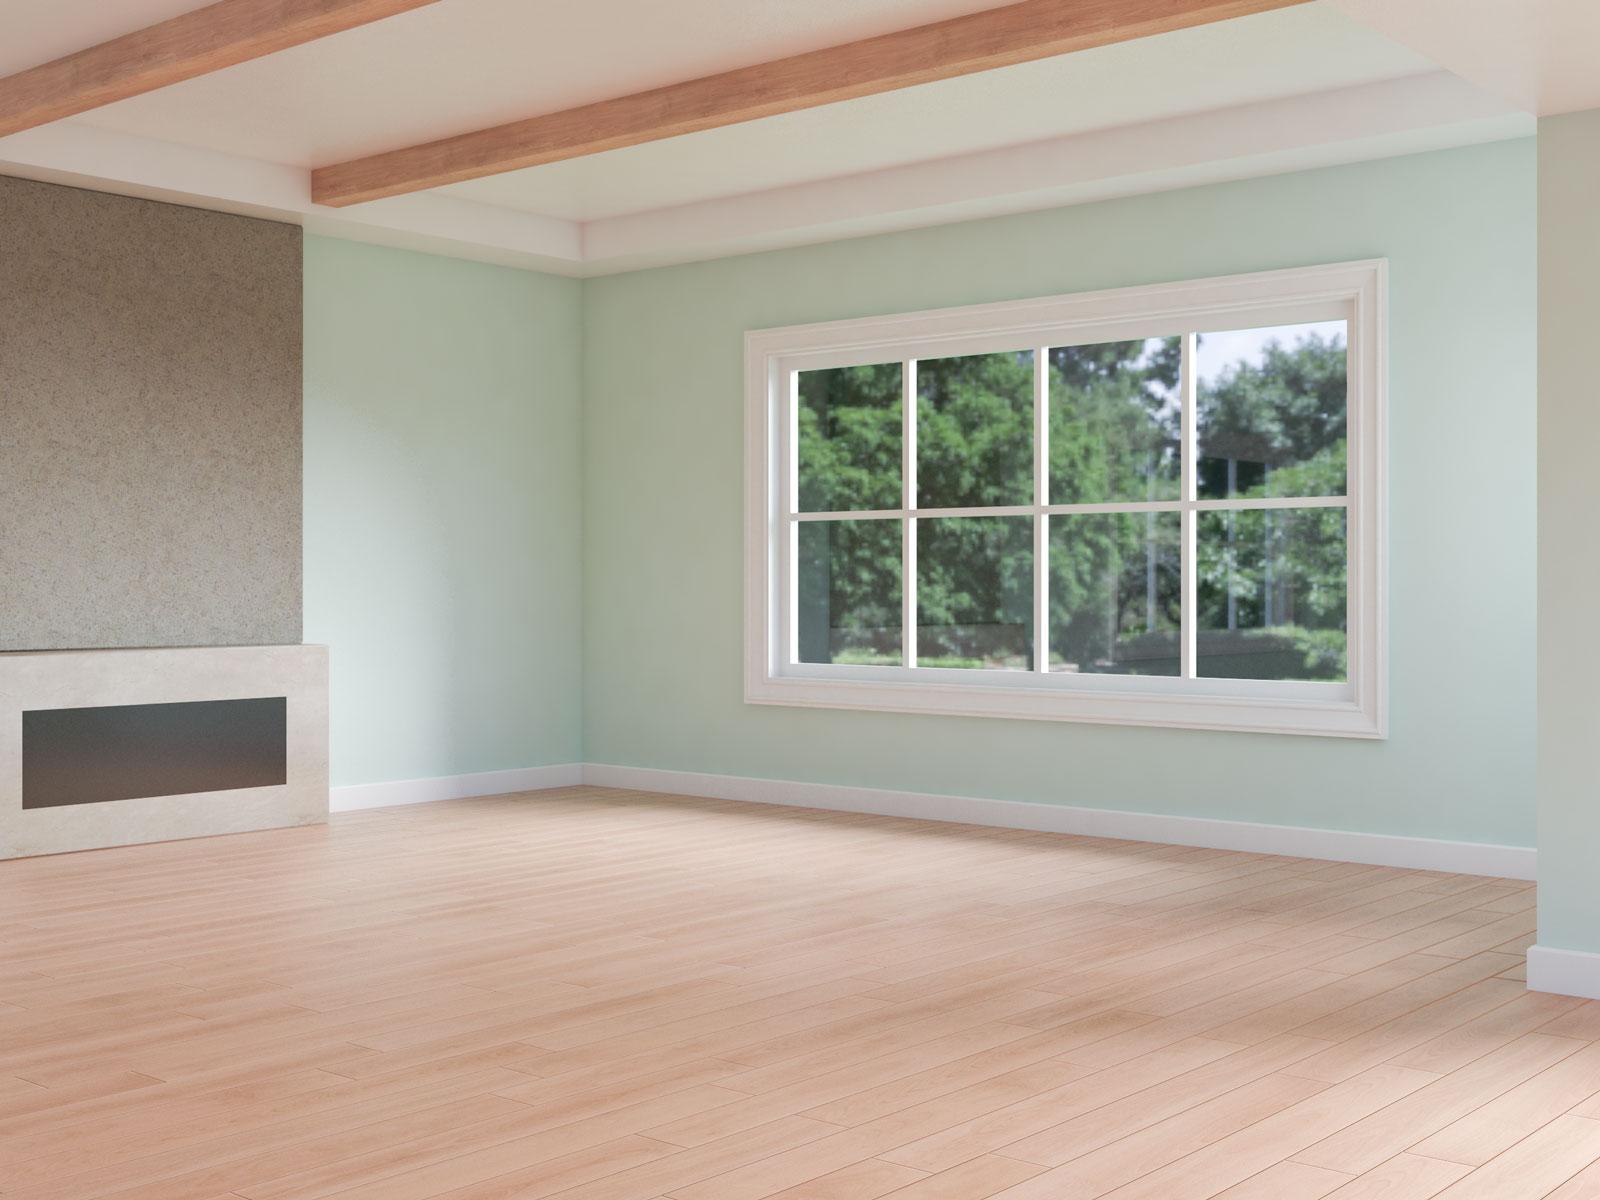 Light mint walls with red oak floors